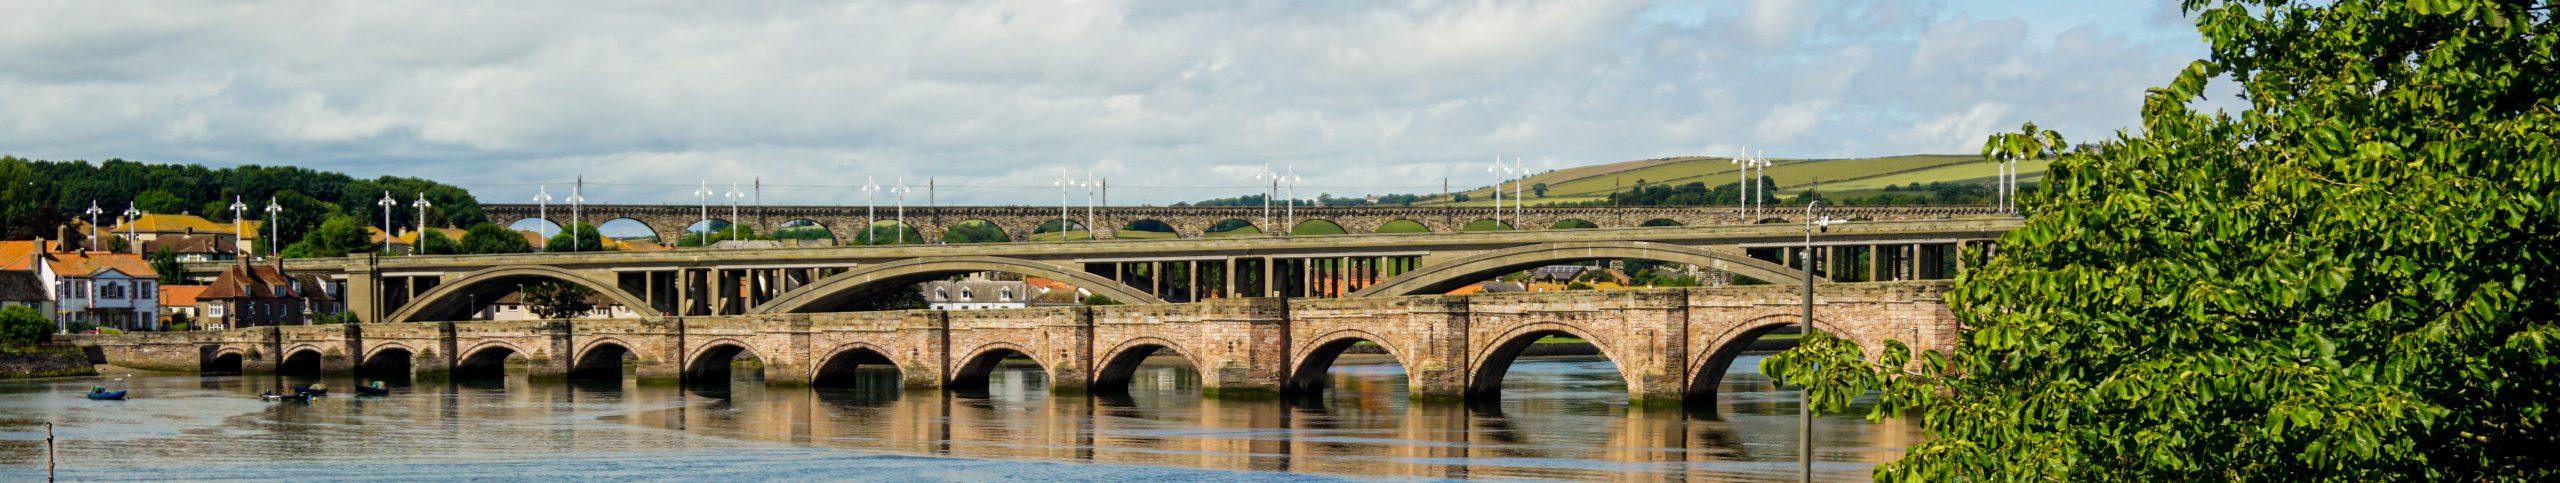 Panorama of three bridges